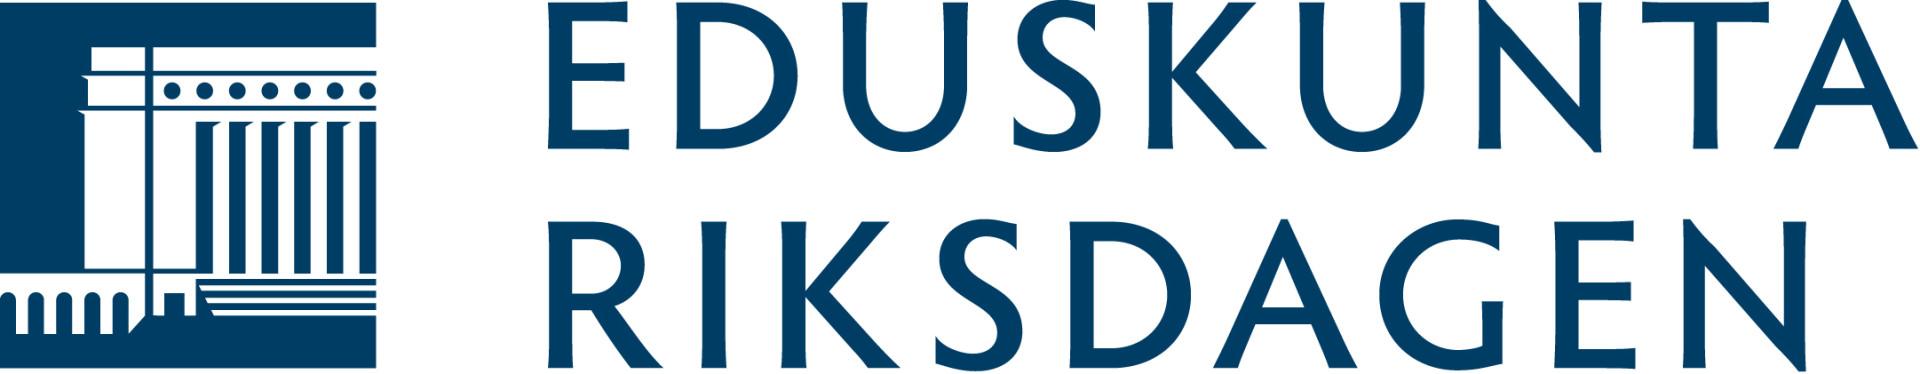 Suomen Eduskunta - Logo